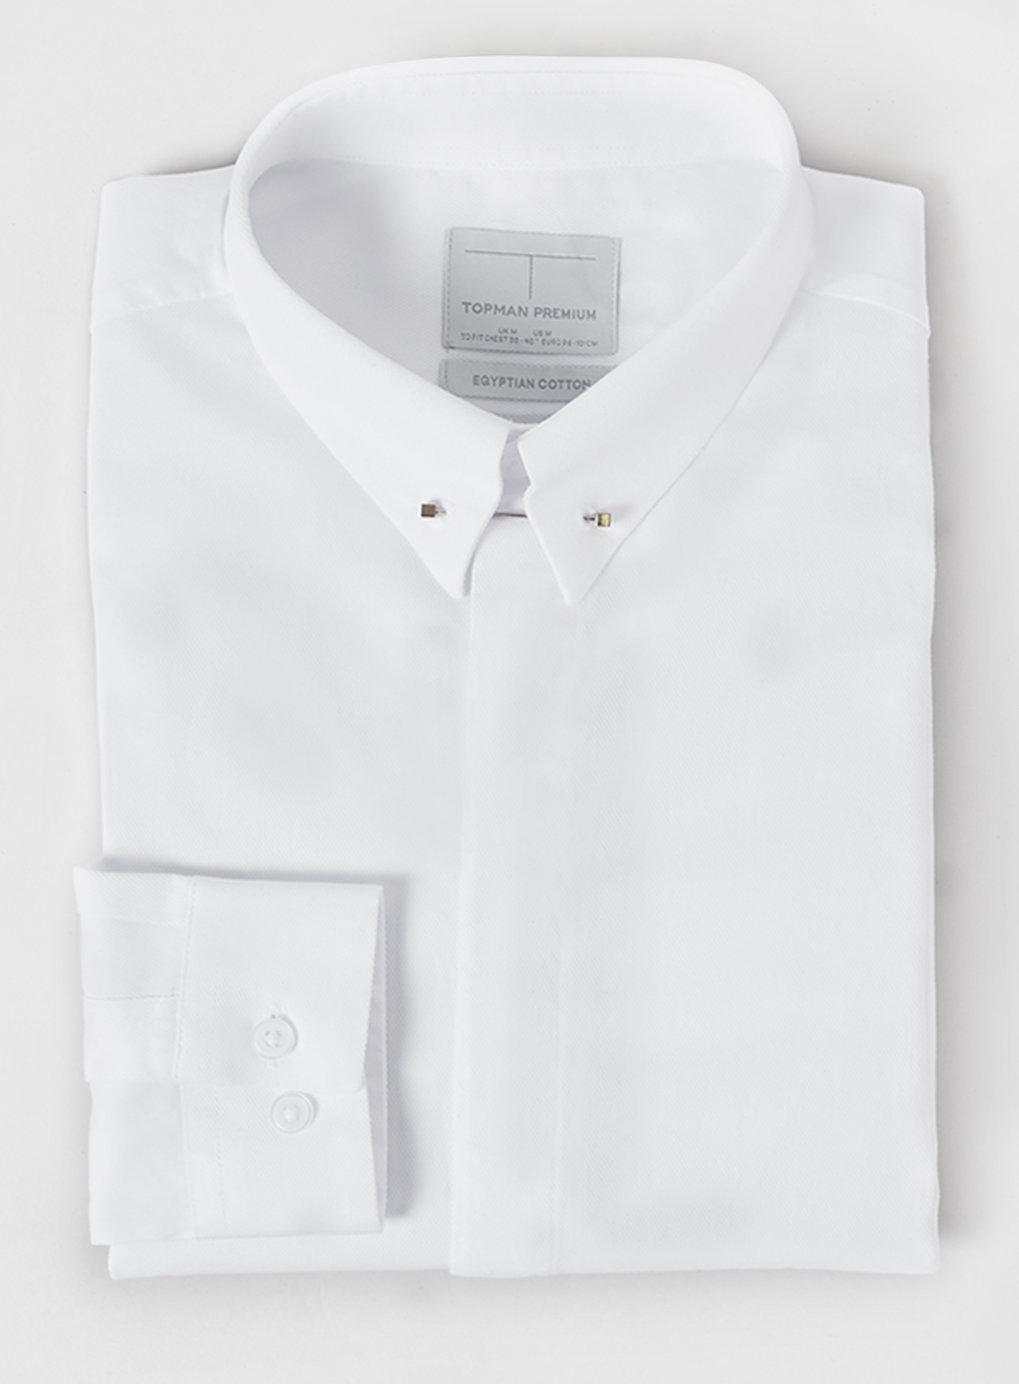 Topman premium long sleeve white pin collar smart folded for White shirt with collar pin